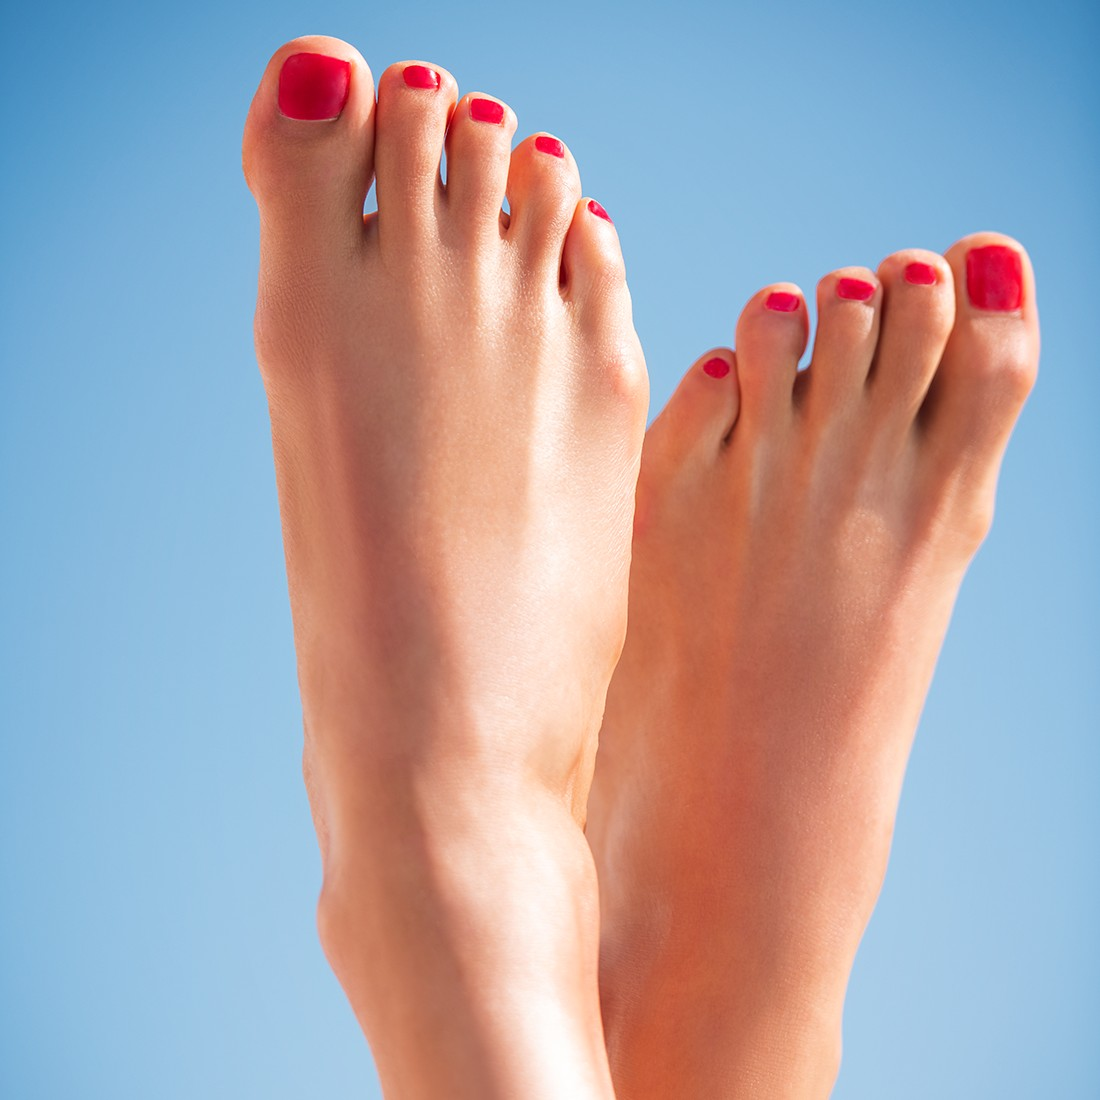 crosscategory-beautyvisual-summerfeetandleg-red-toes-062022-tif-1280-x-1280